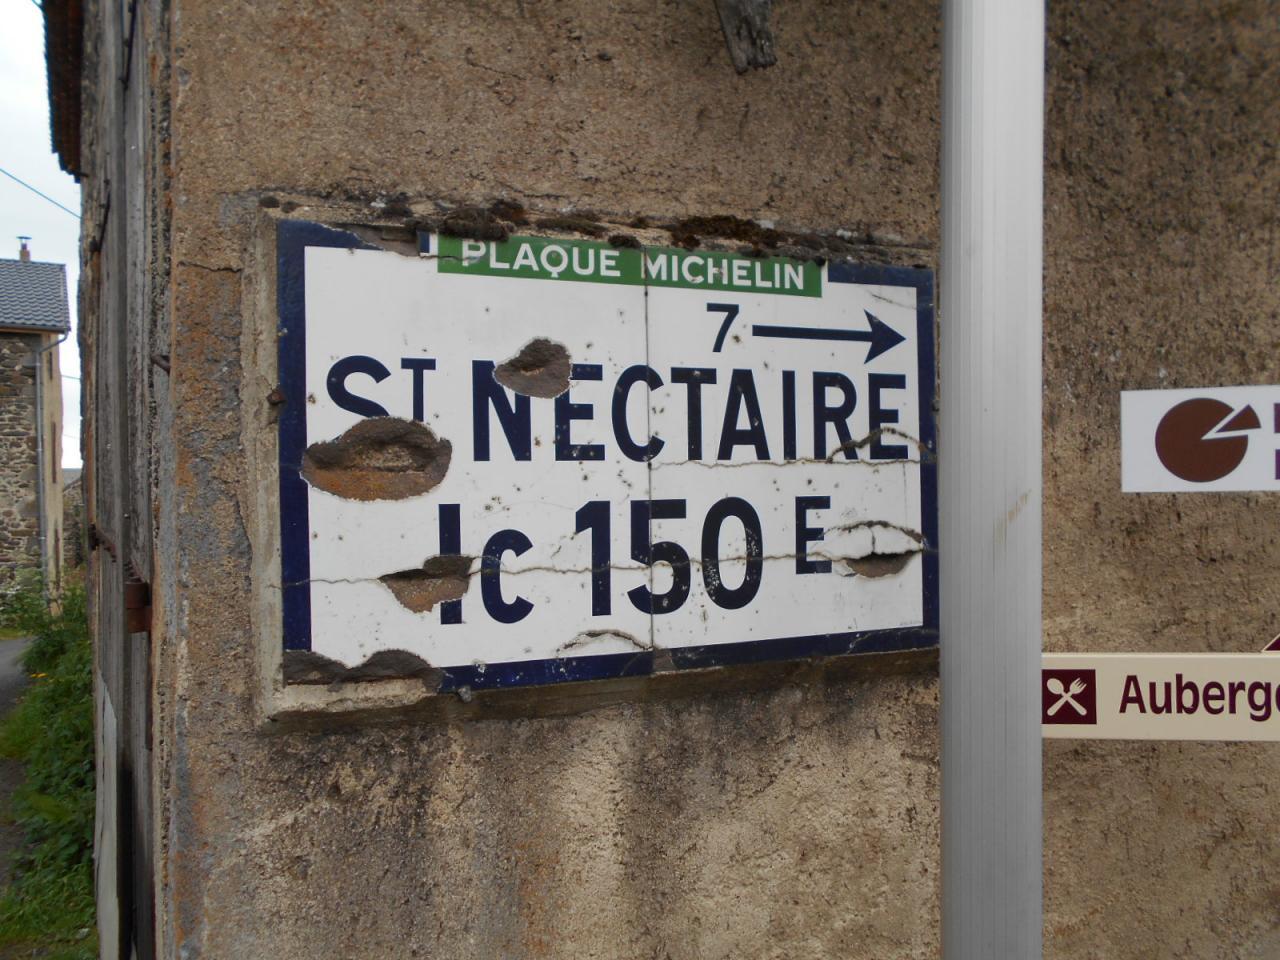 63 710 Les Arnats (2)